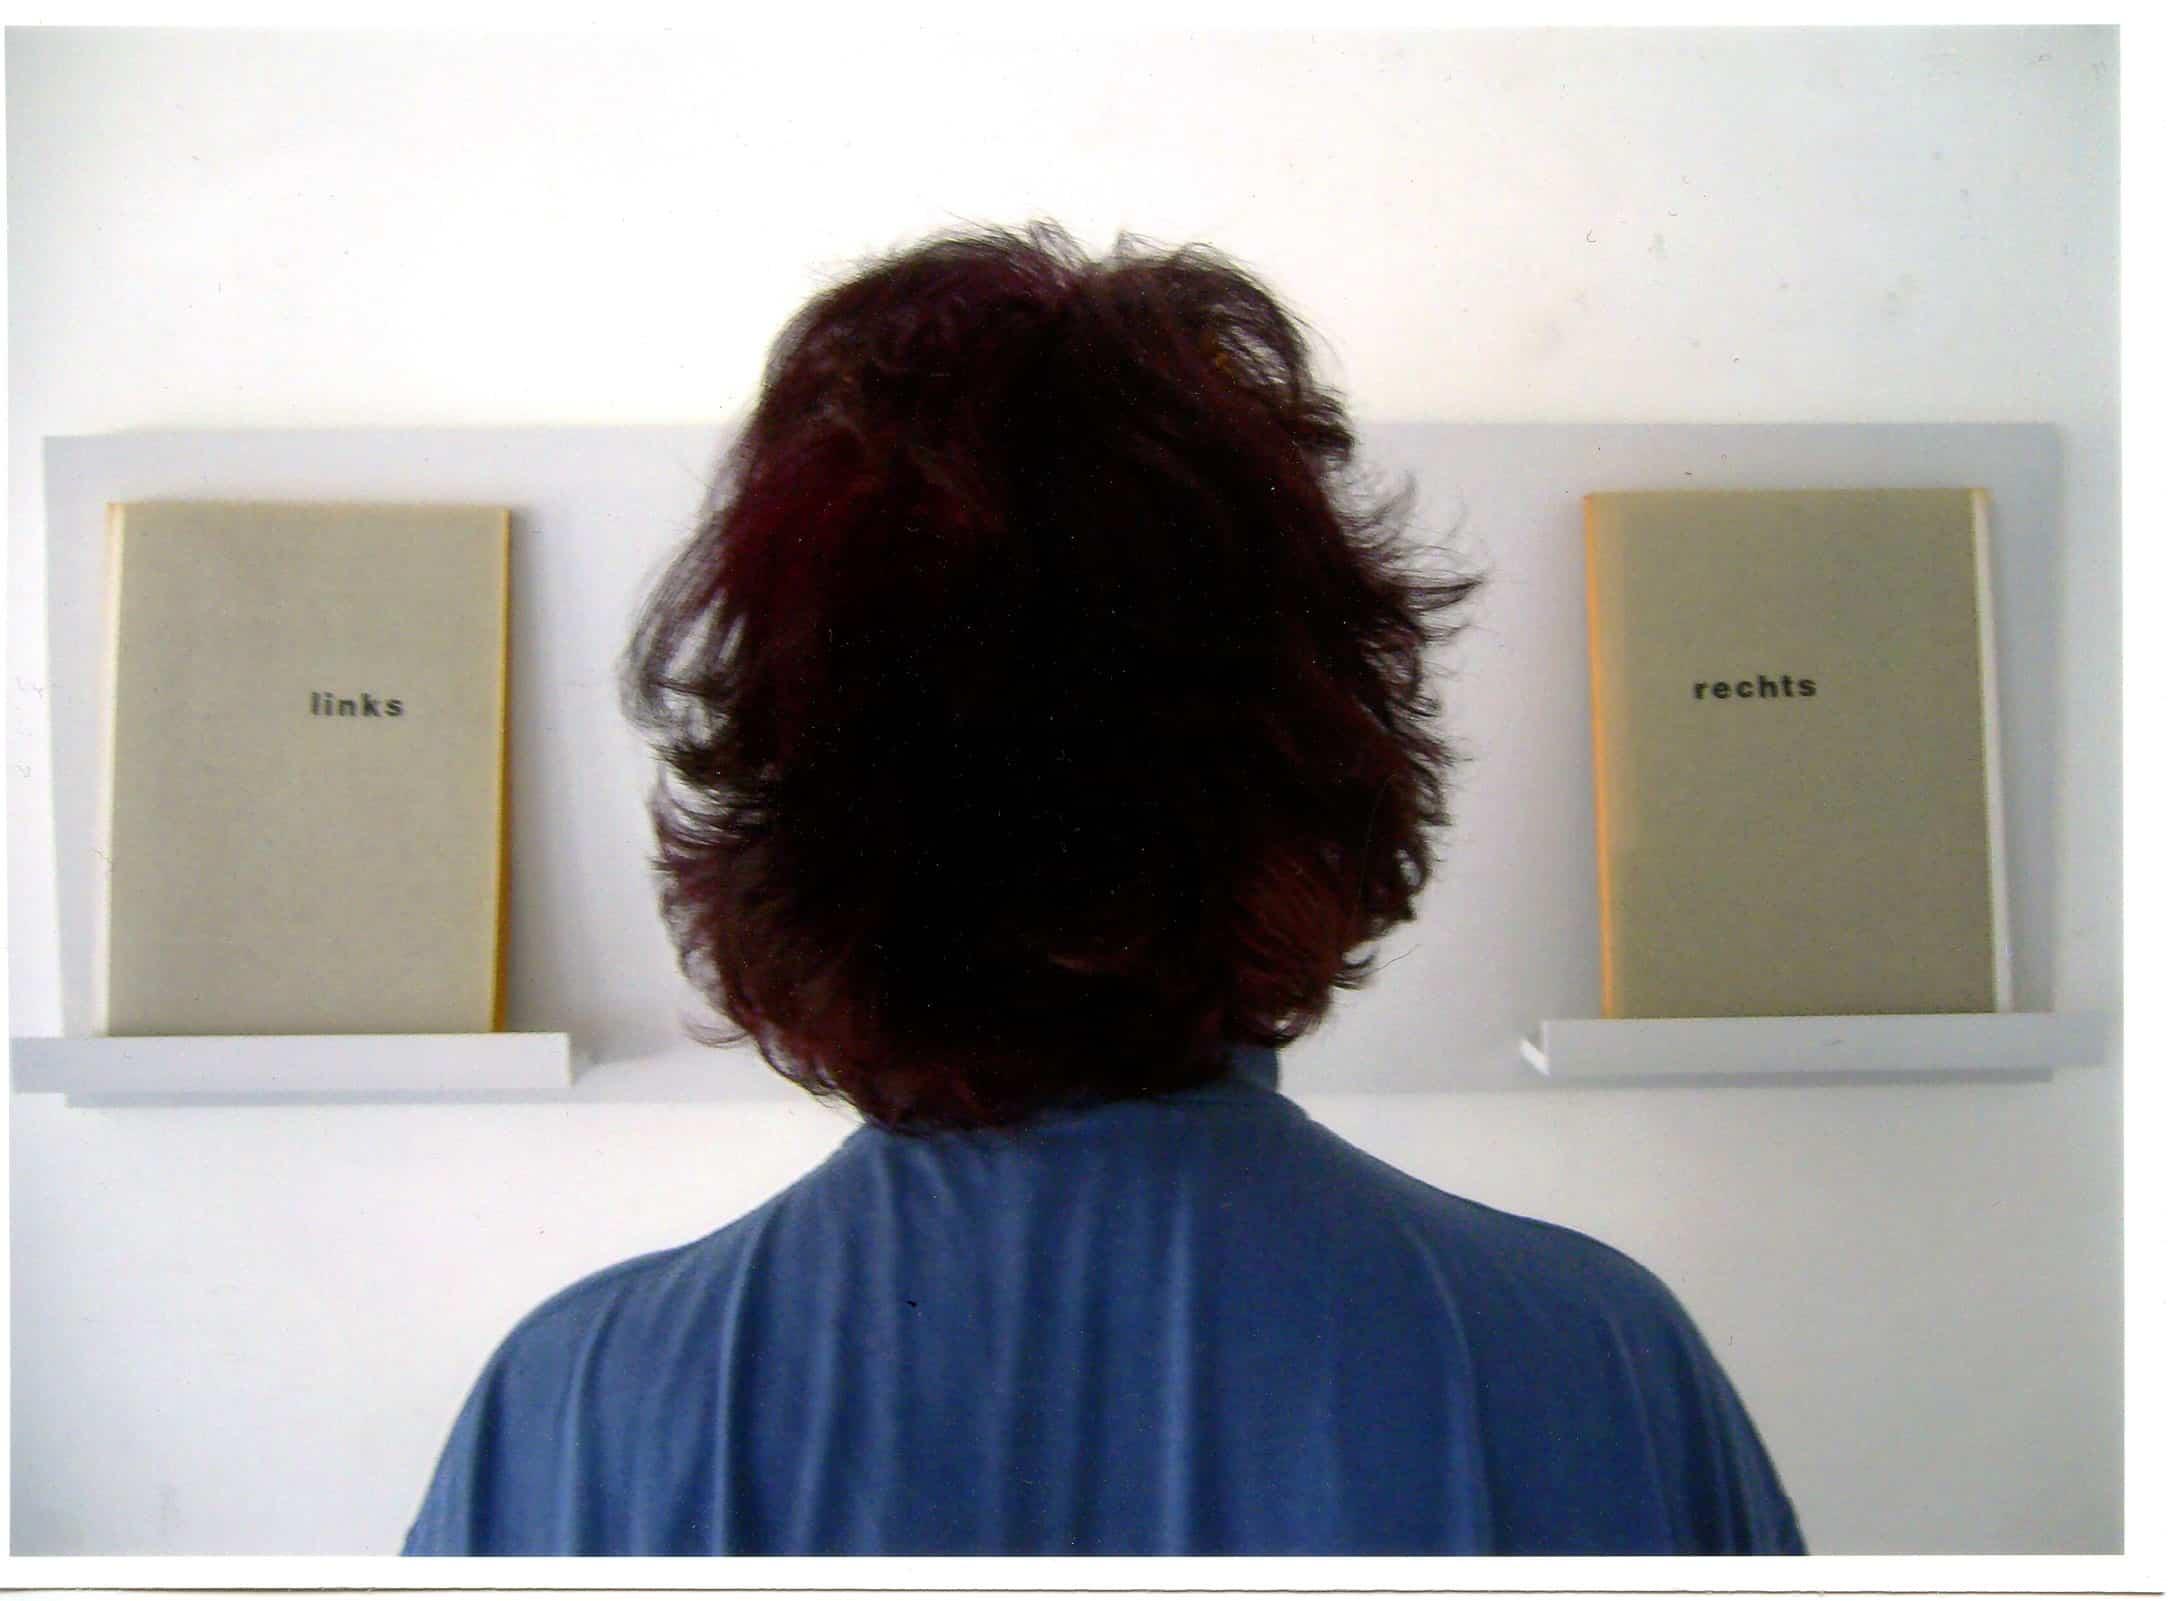 żak branicka exhibition